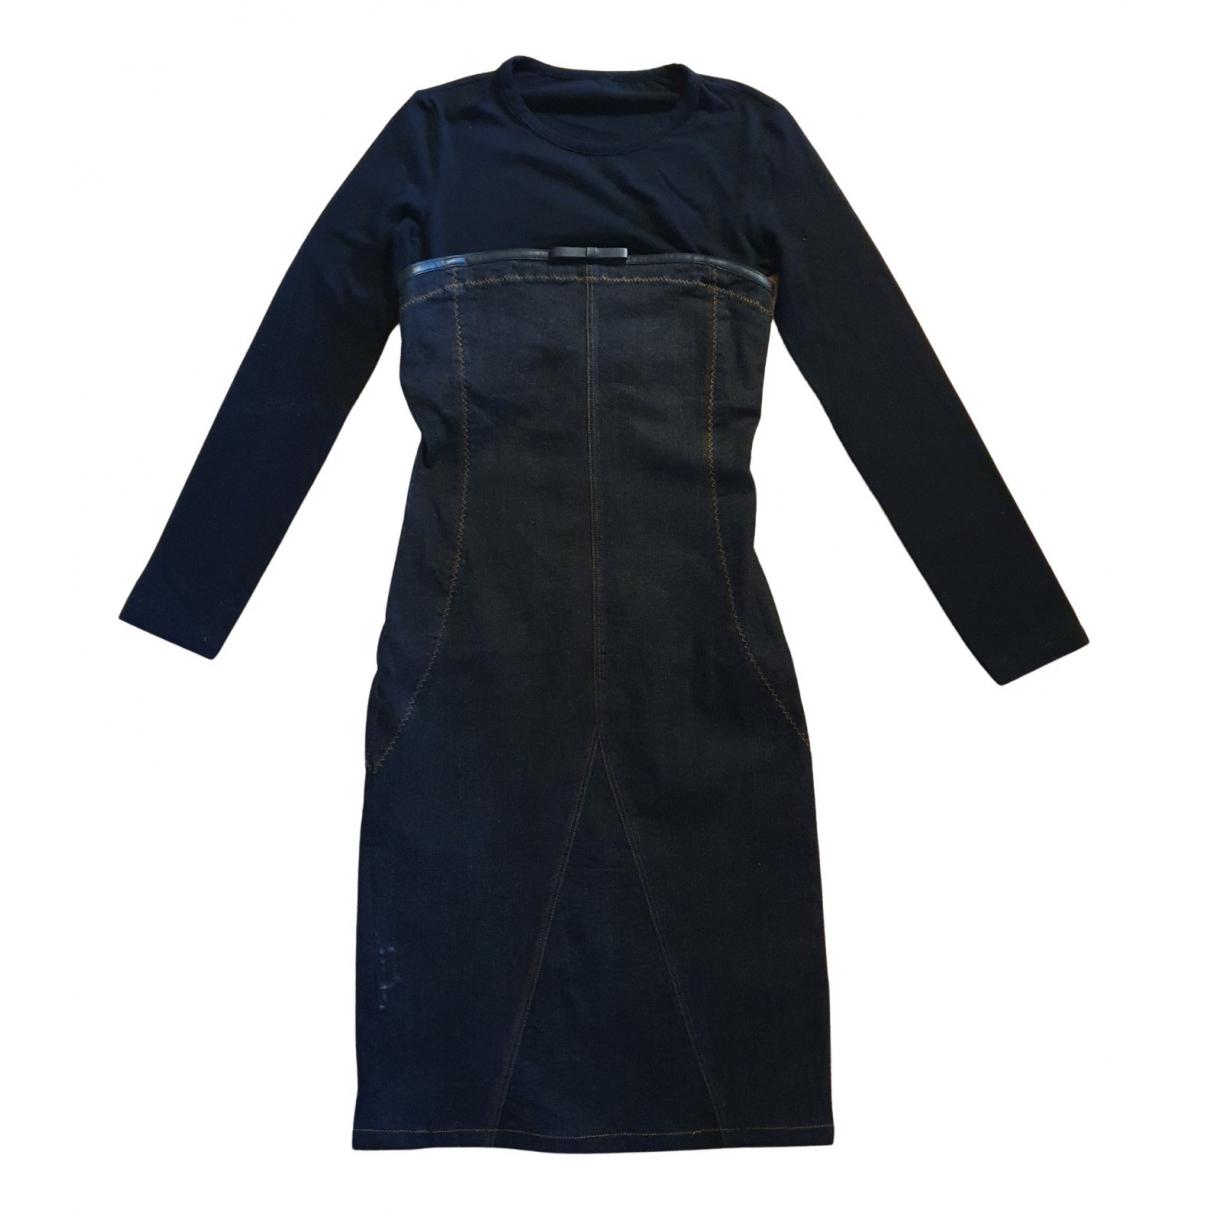 Gianfranco Ferre - Robe   pour femme en coton - elasthane - noir